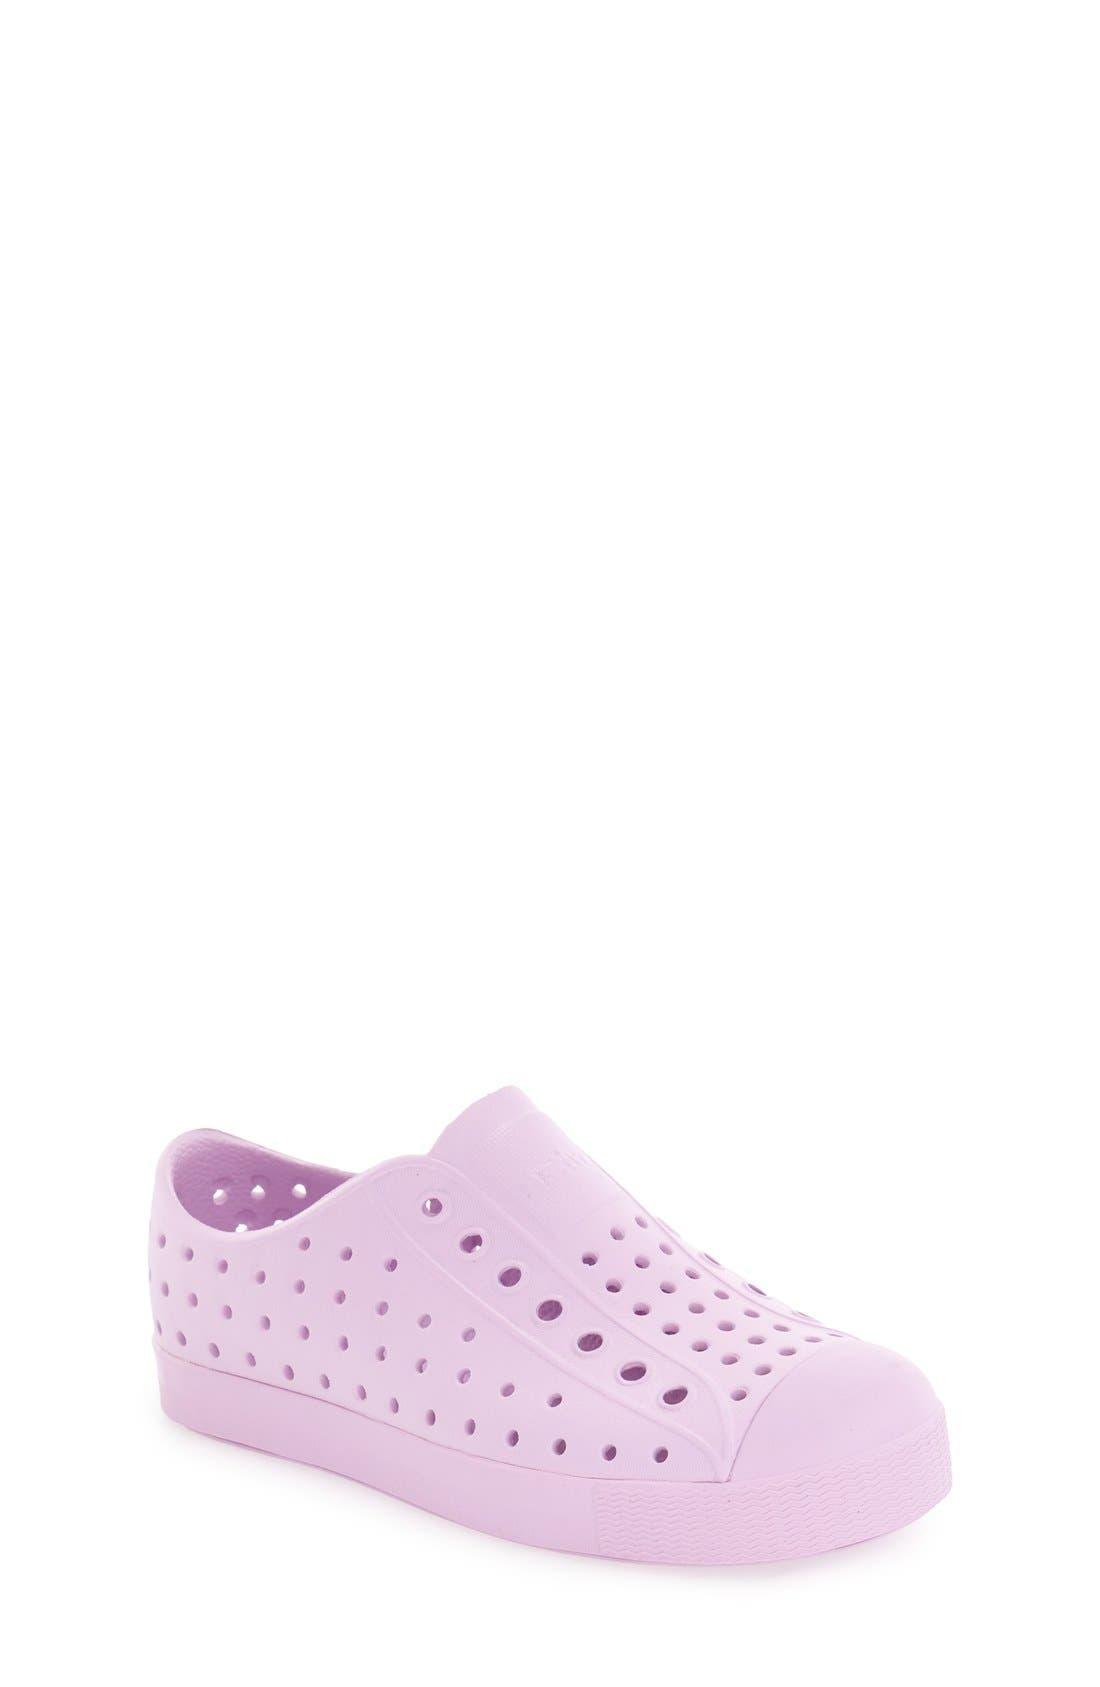 'Jefferson' Water Friendly Slip-On Sneaker,                             Main thumbnail 53, color,